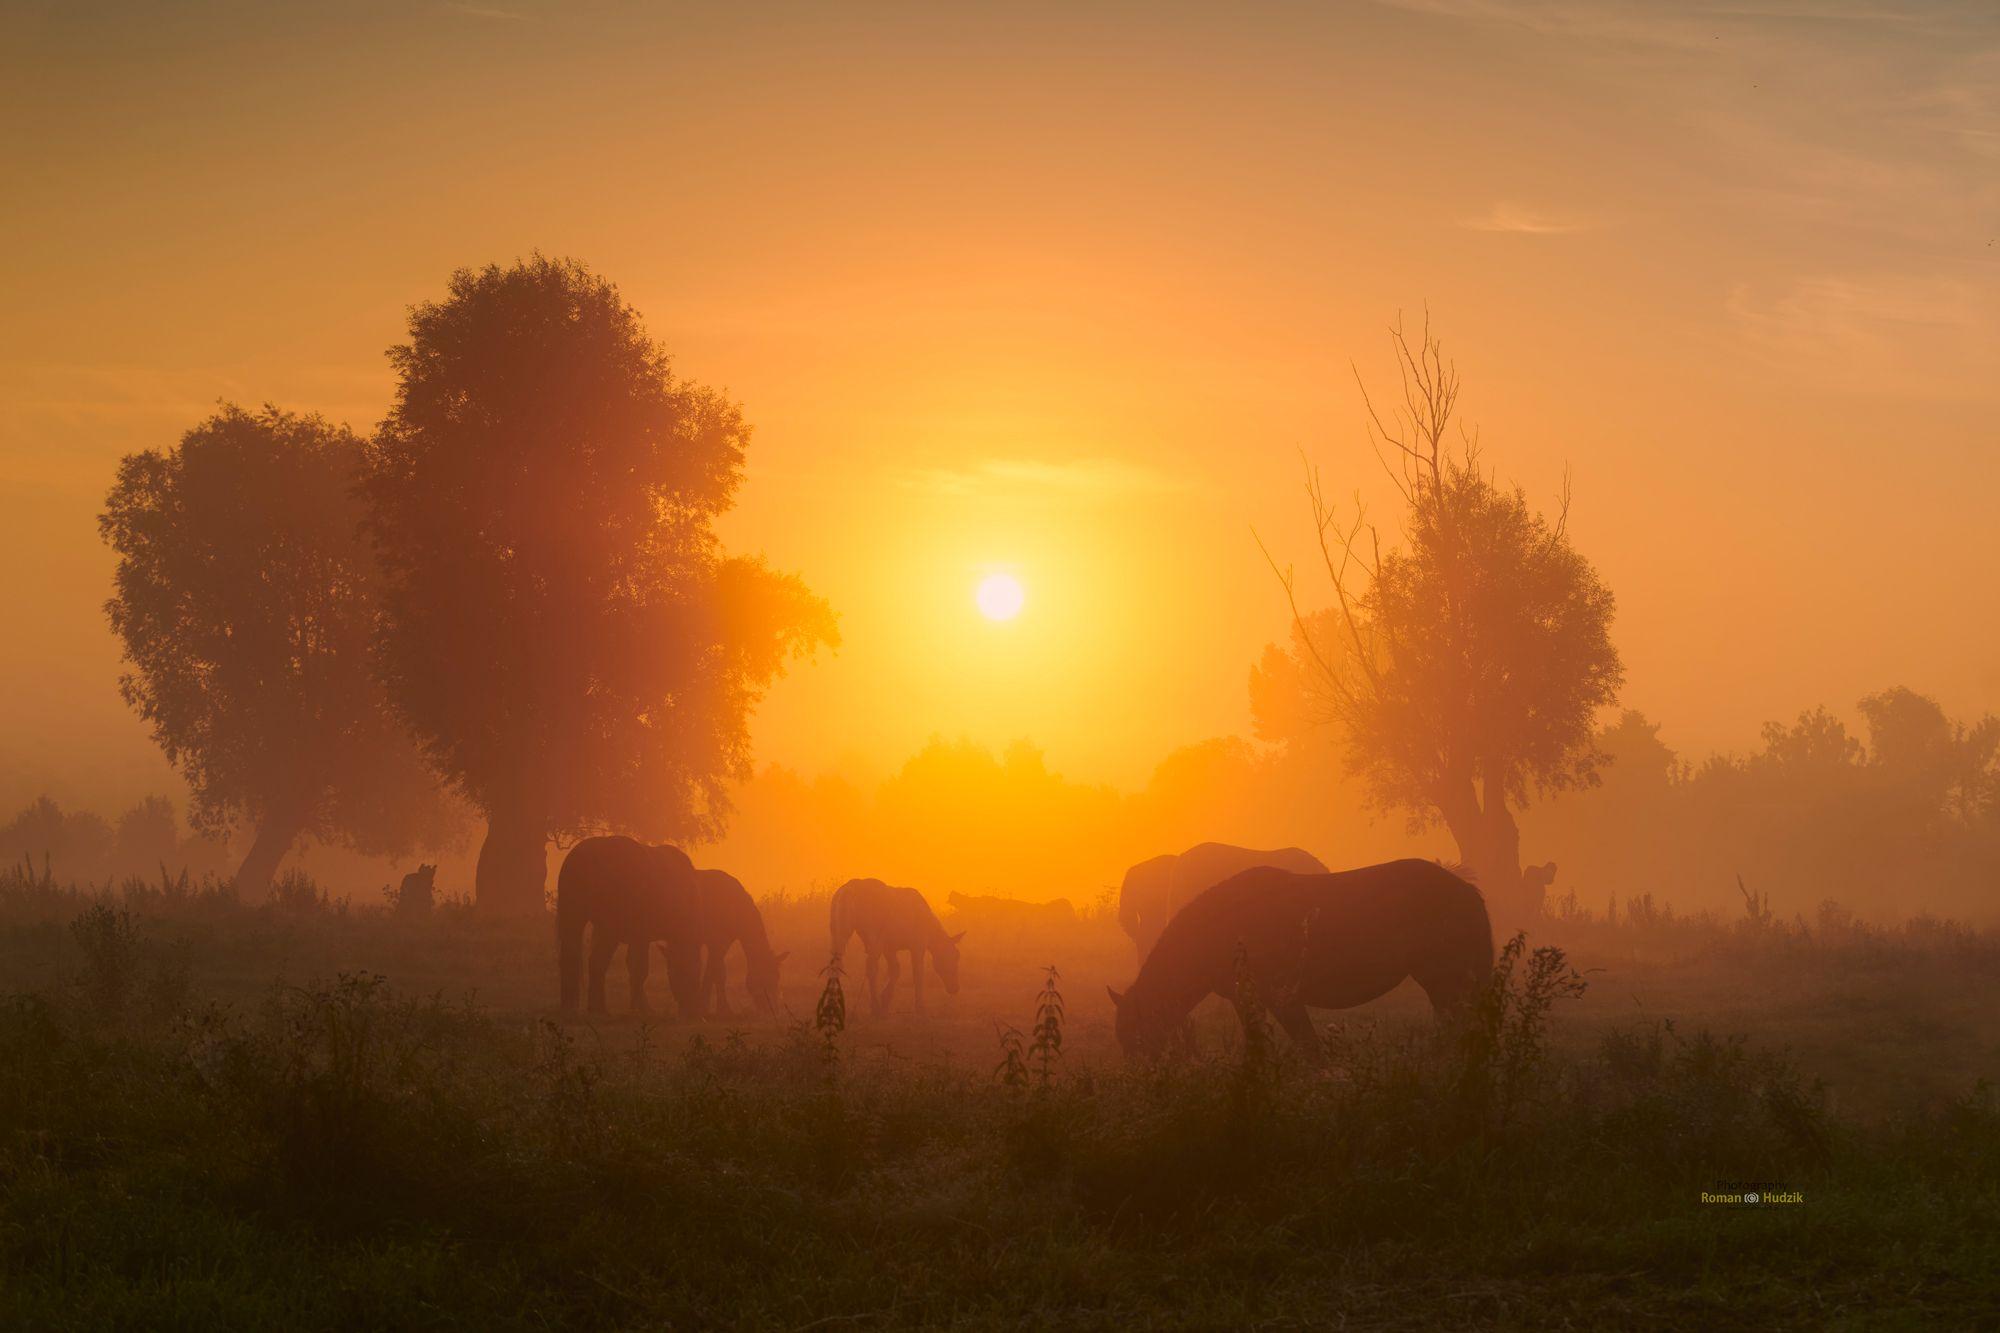 Horses, landscape, sunrise, fog, clouds, orange color, trees,, Hudzik Roman